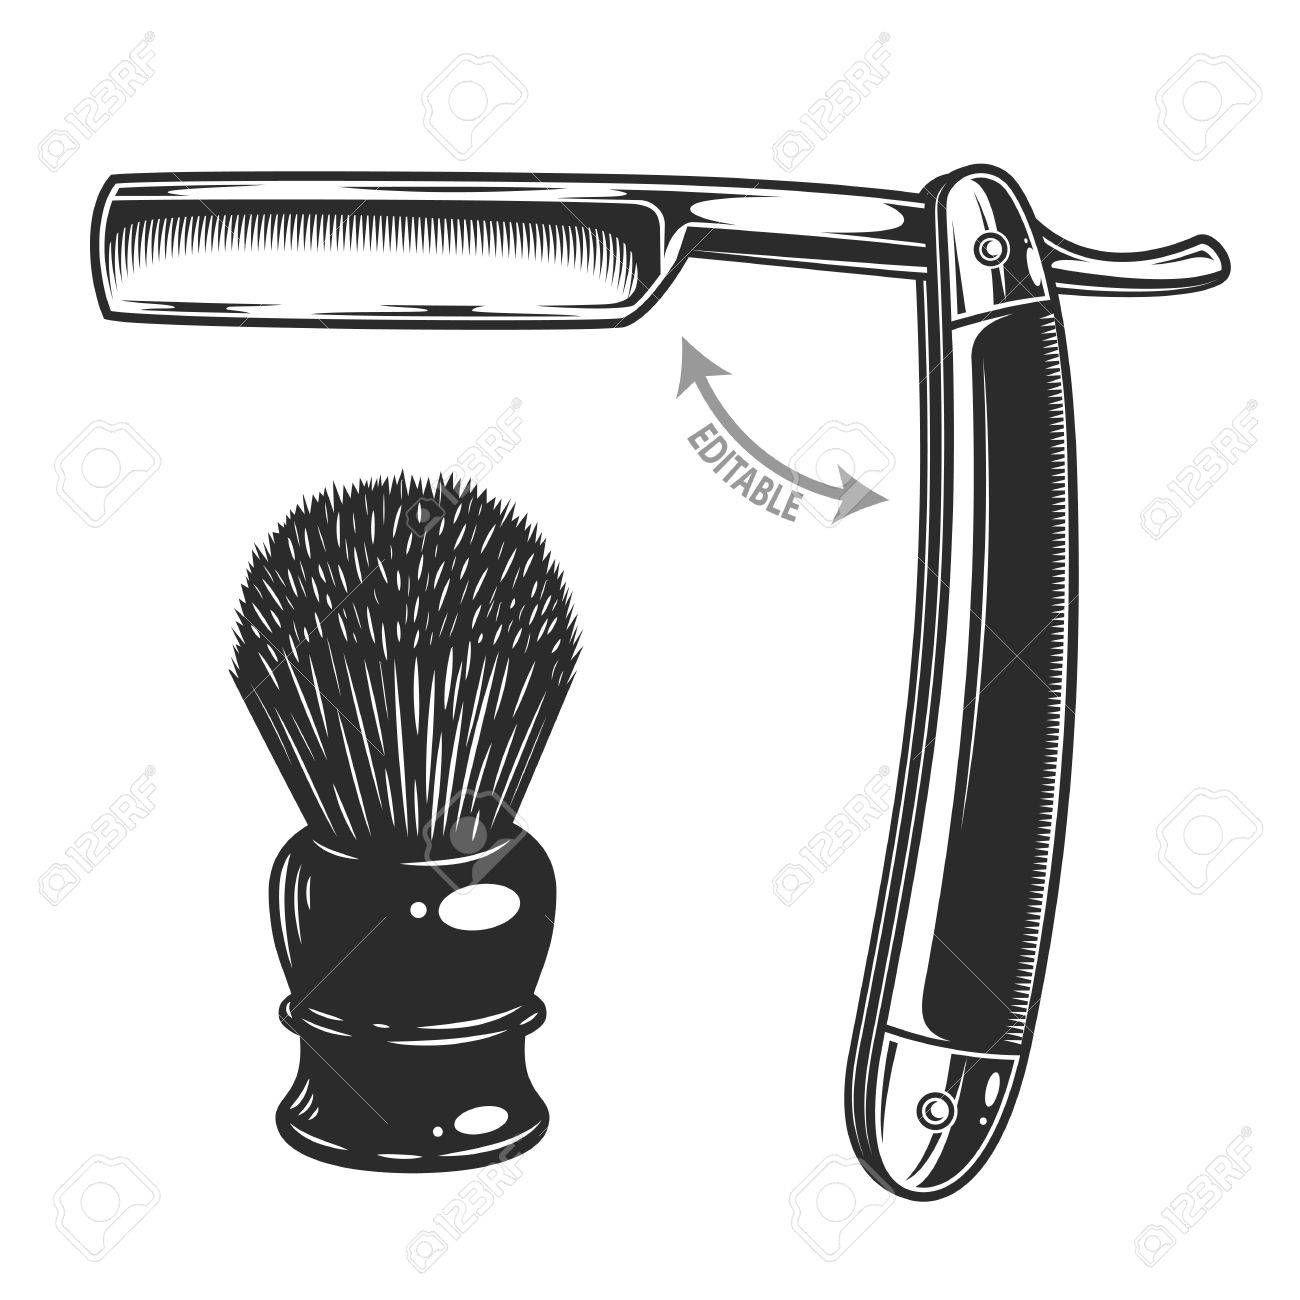 Monochrome Illustration Of Straight Razor And Shaving Brush Isolated On White Background A Tatuaje De Peluquero Logos Para Barberia Ilustracion De Calavera